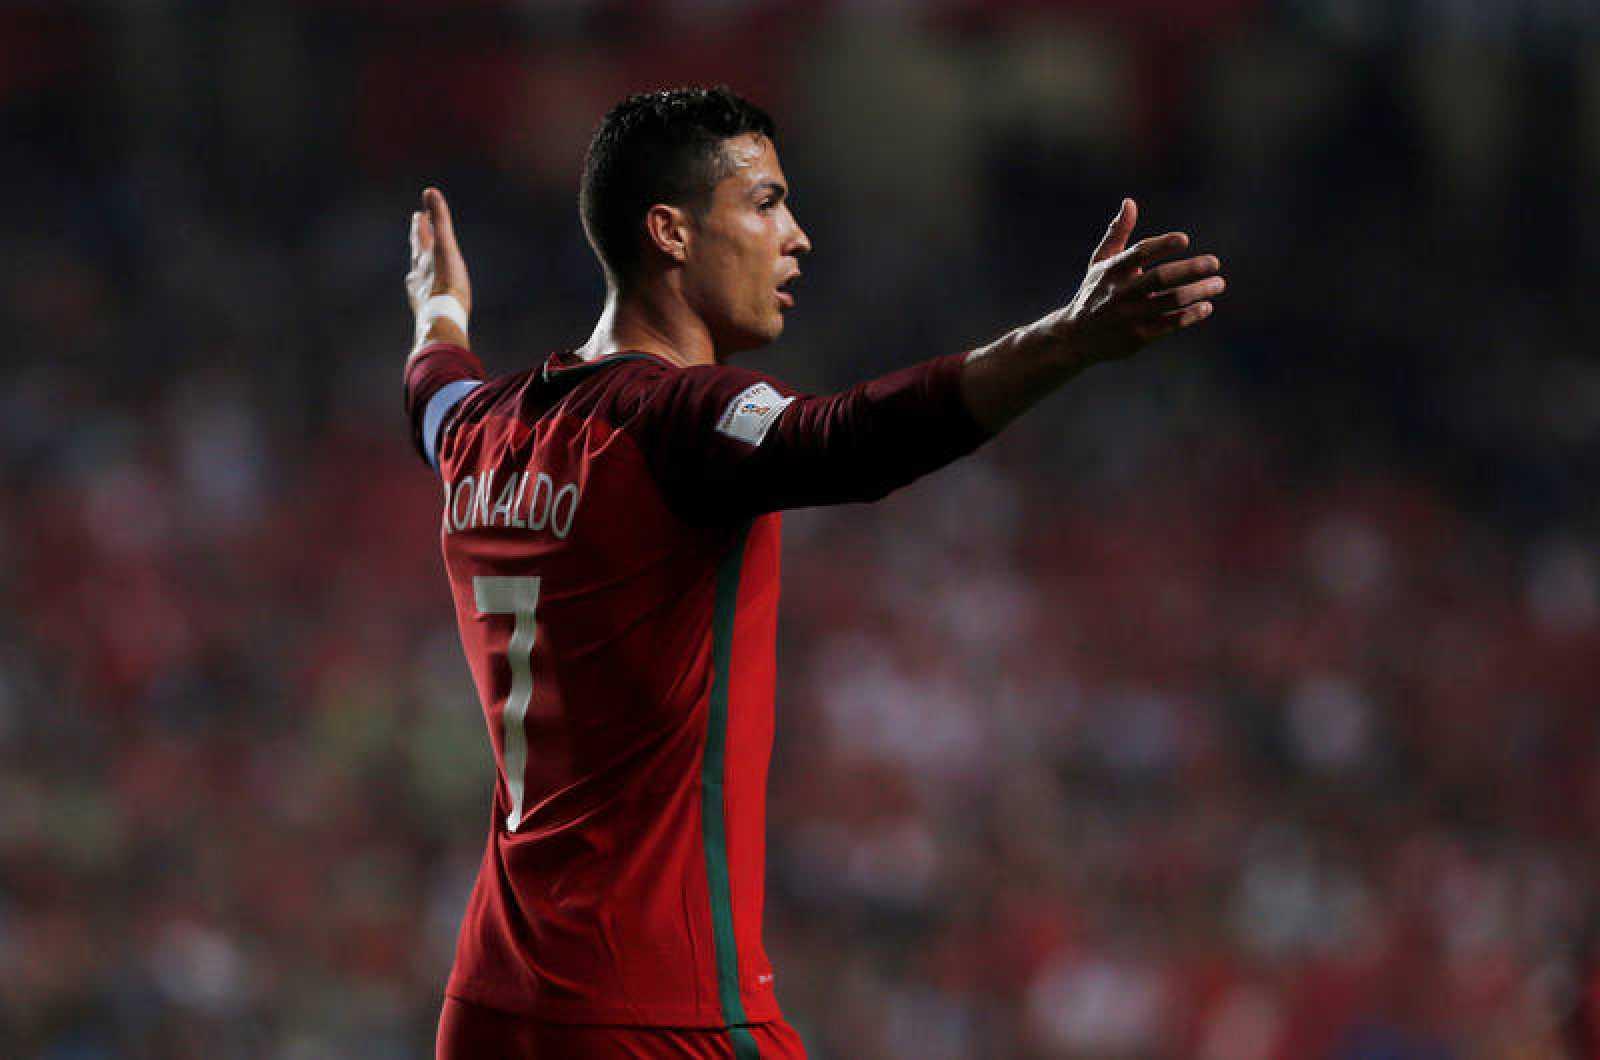 Cristiano Ronaldo en un lance del partido ante Suiza.